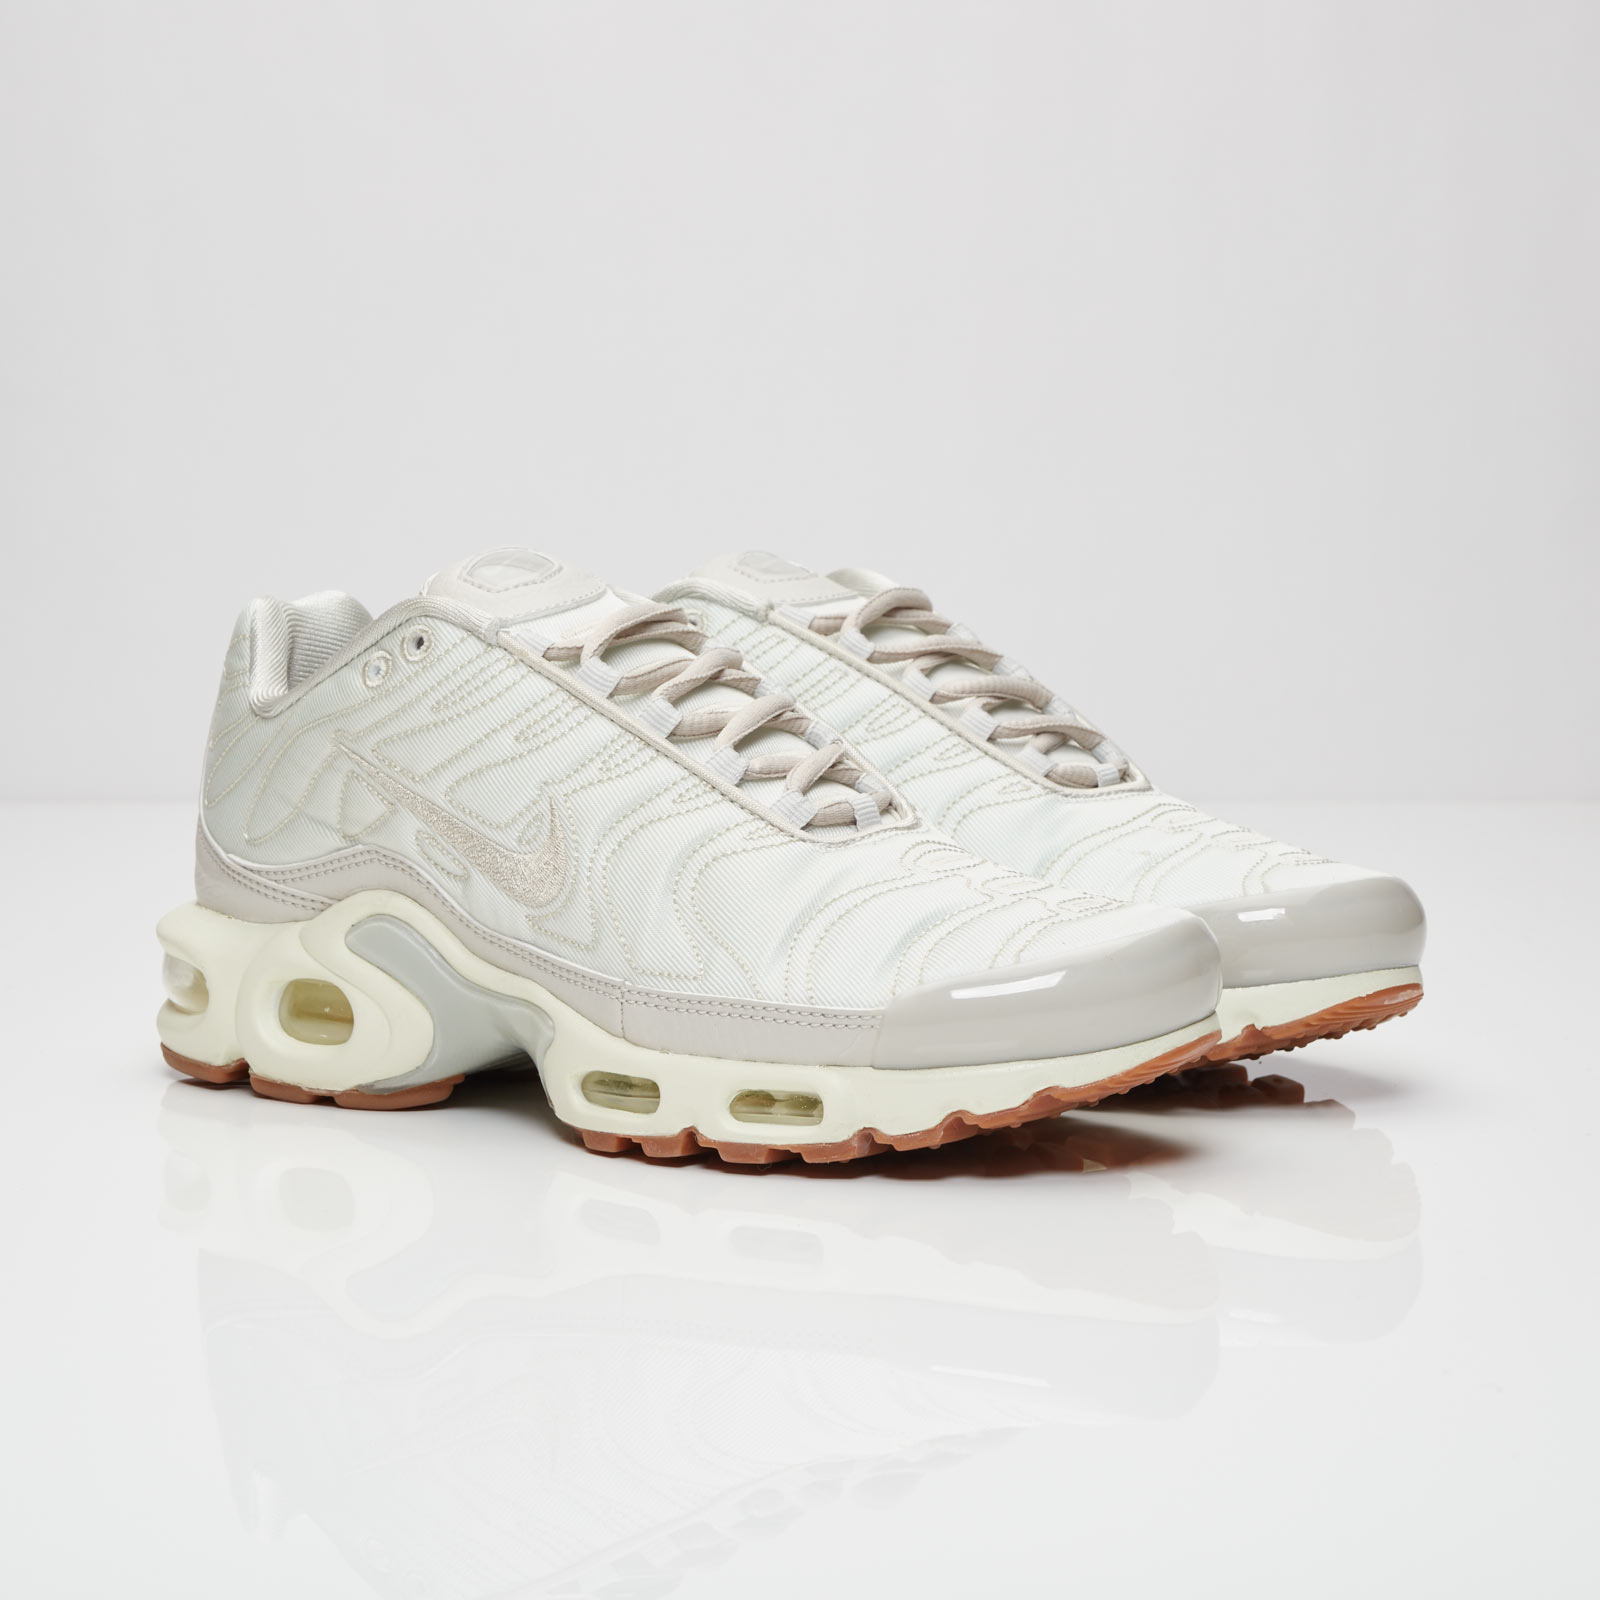 Nike Wmns Air Max Plus Premium - 848891-002 - Sneakersnstuff ... ec7623abe